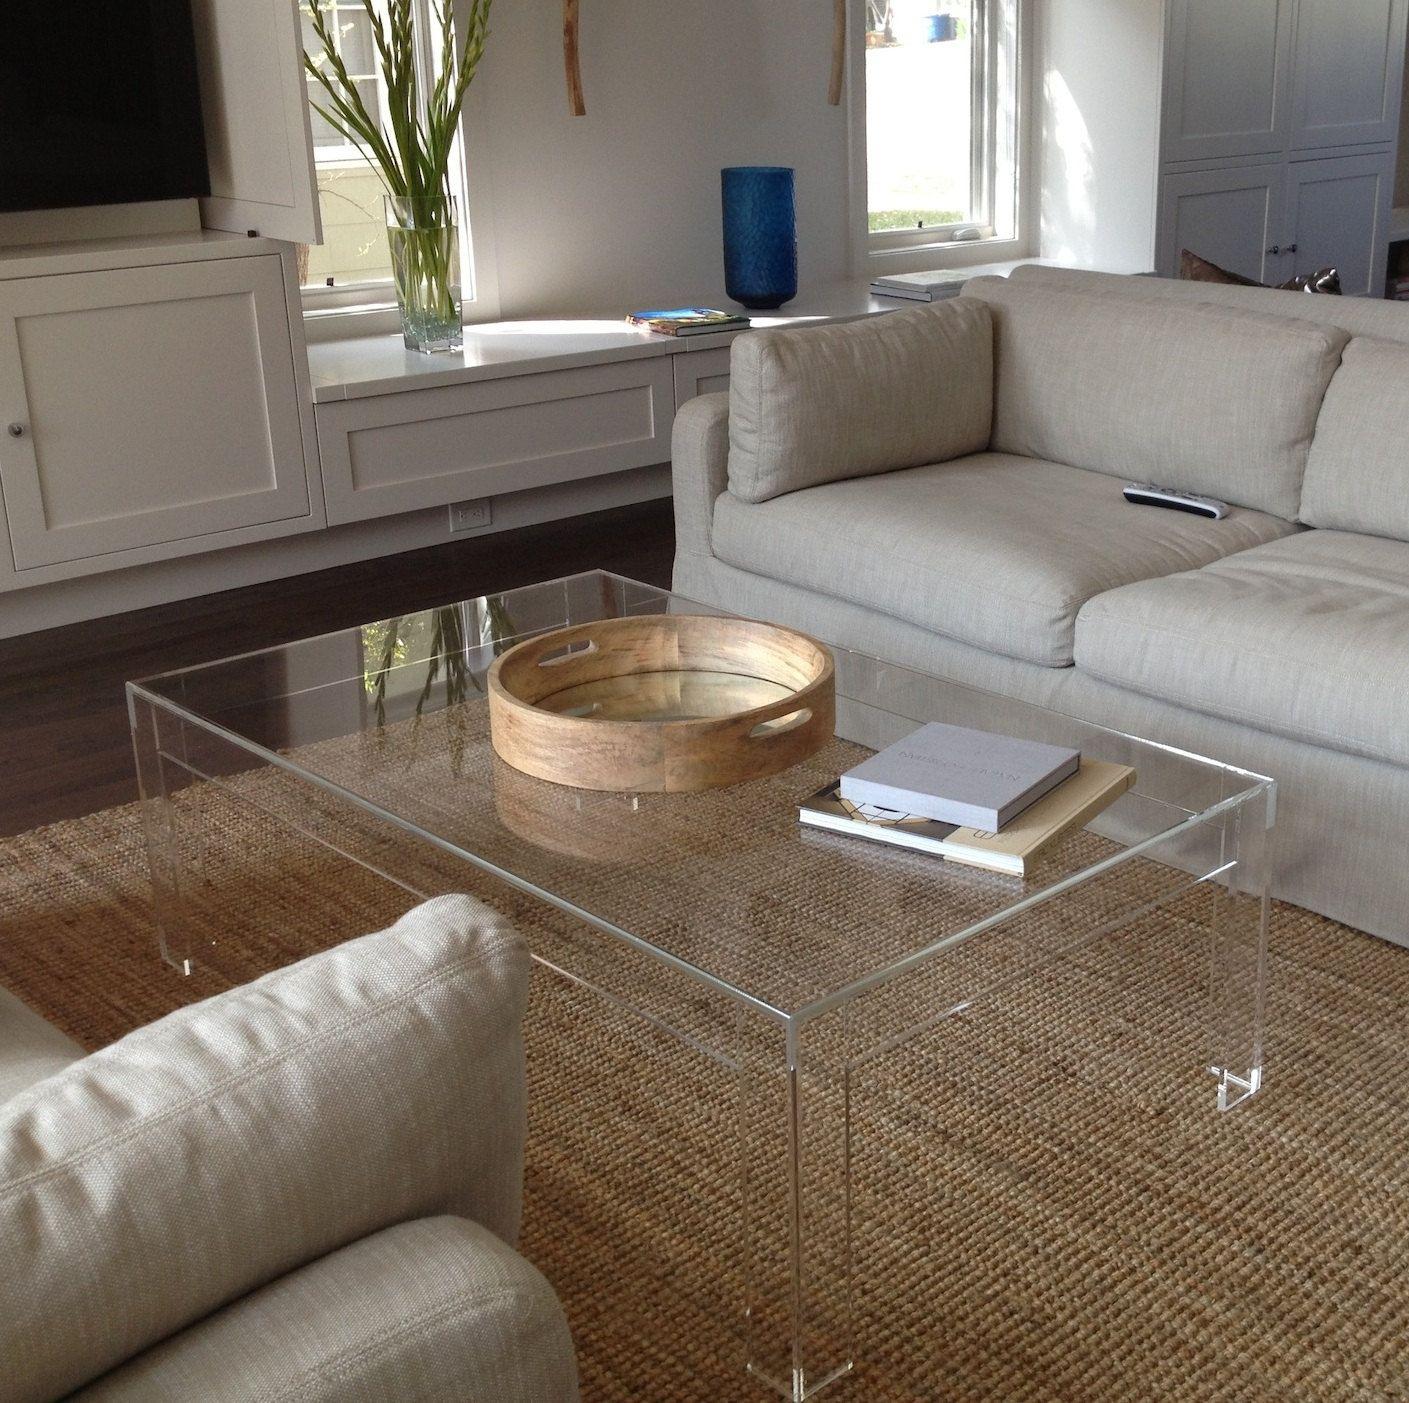 Clear Acrylic Coffee Table | diy furniture | Pinterest ...